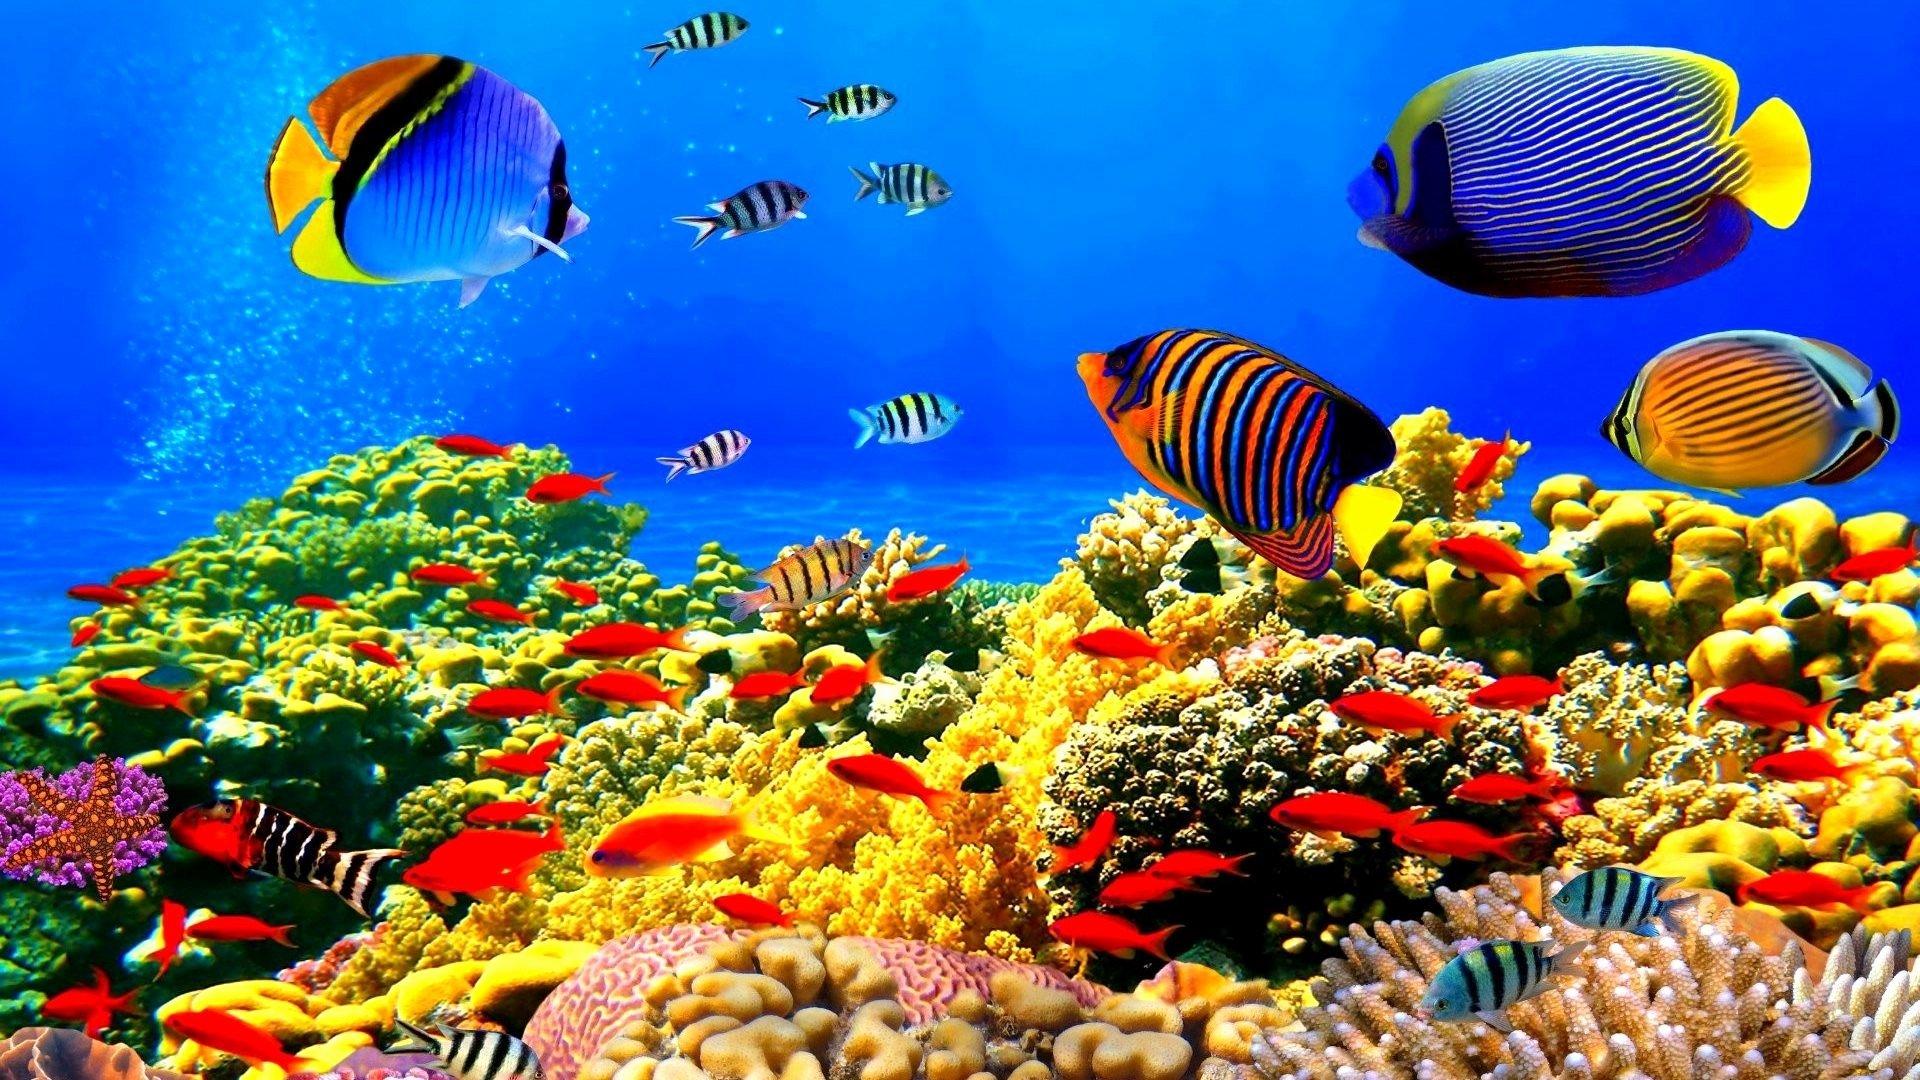 3d Fish Tank Wallpaper Best Of 3d Fish Tank Wallpaper 59 Images